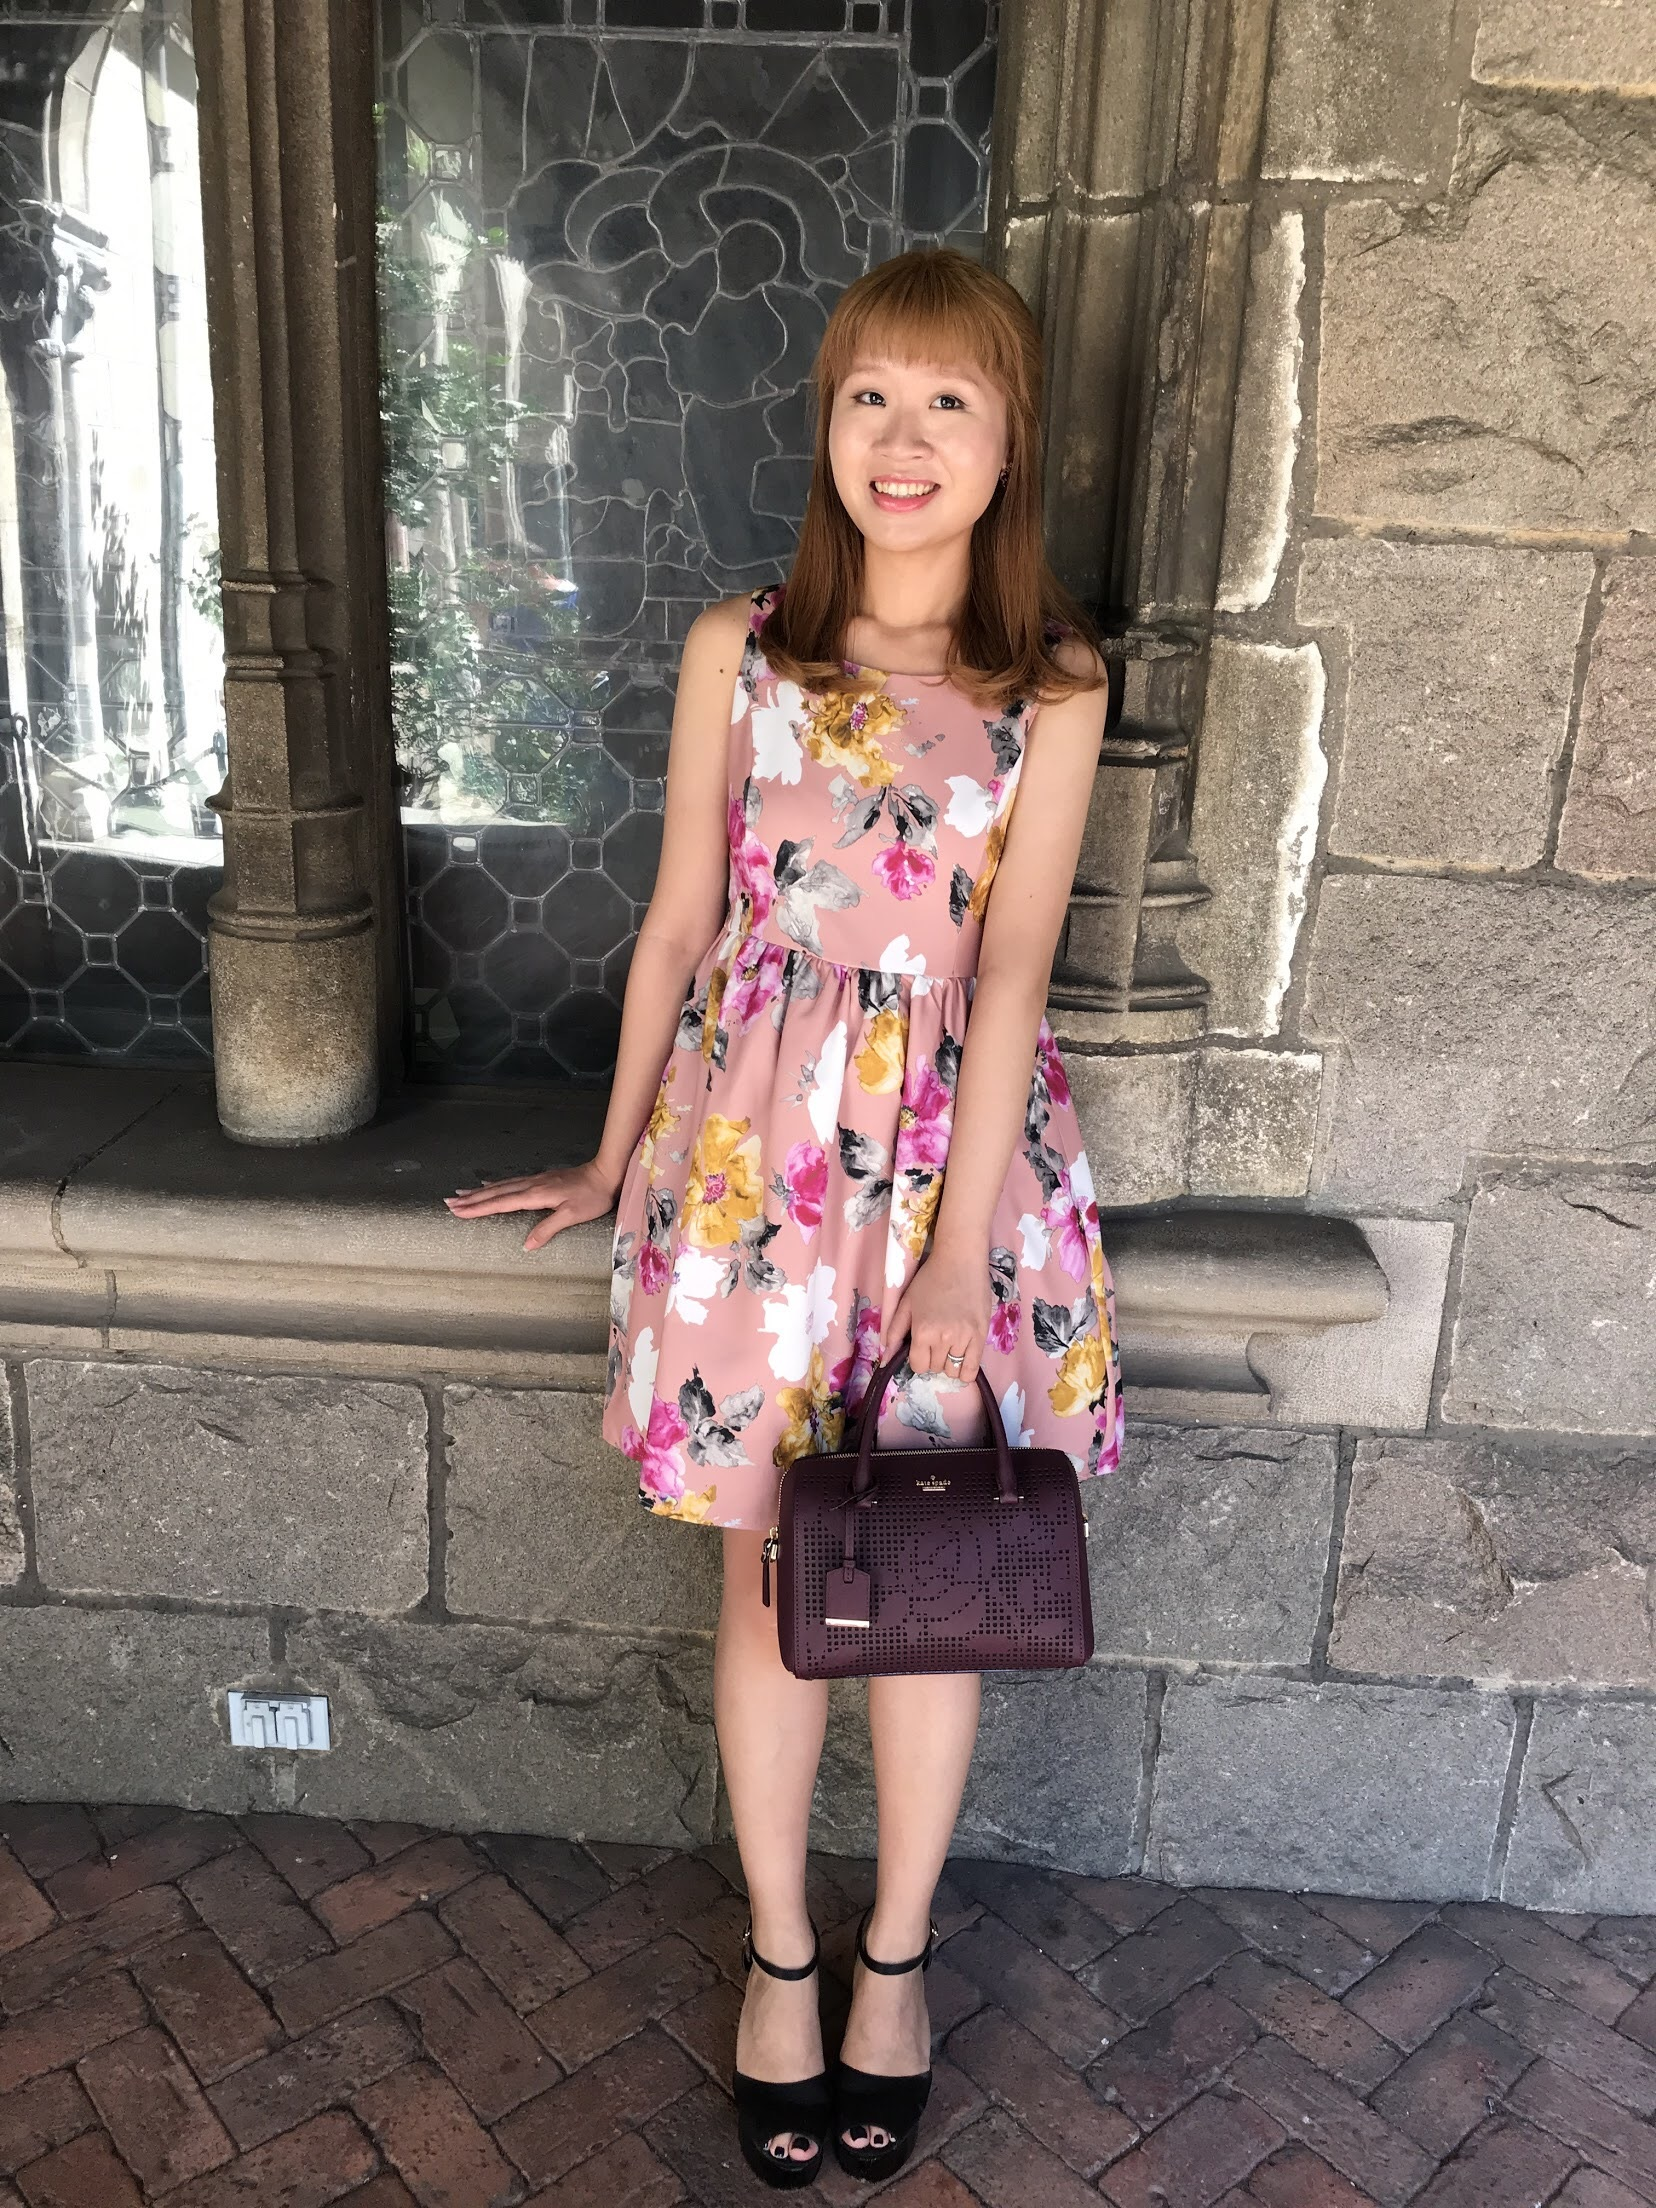 Dress: tocco closet; shoes: dazzlin; bag: Kate Spade.